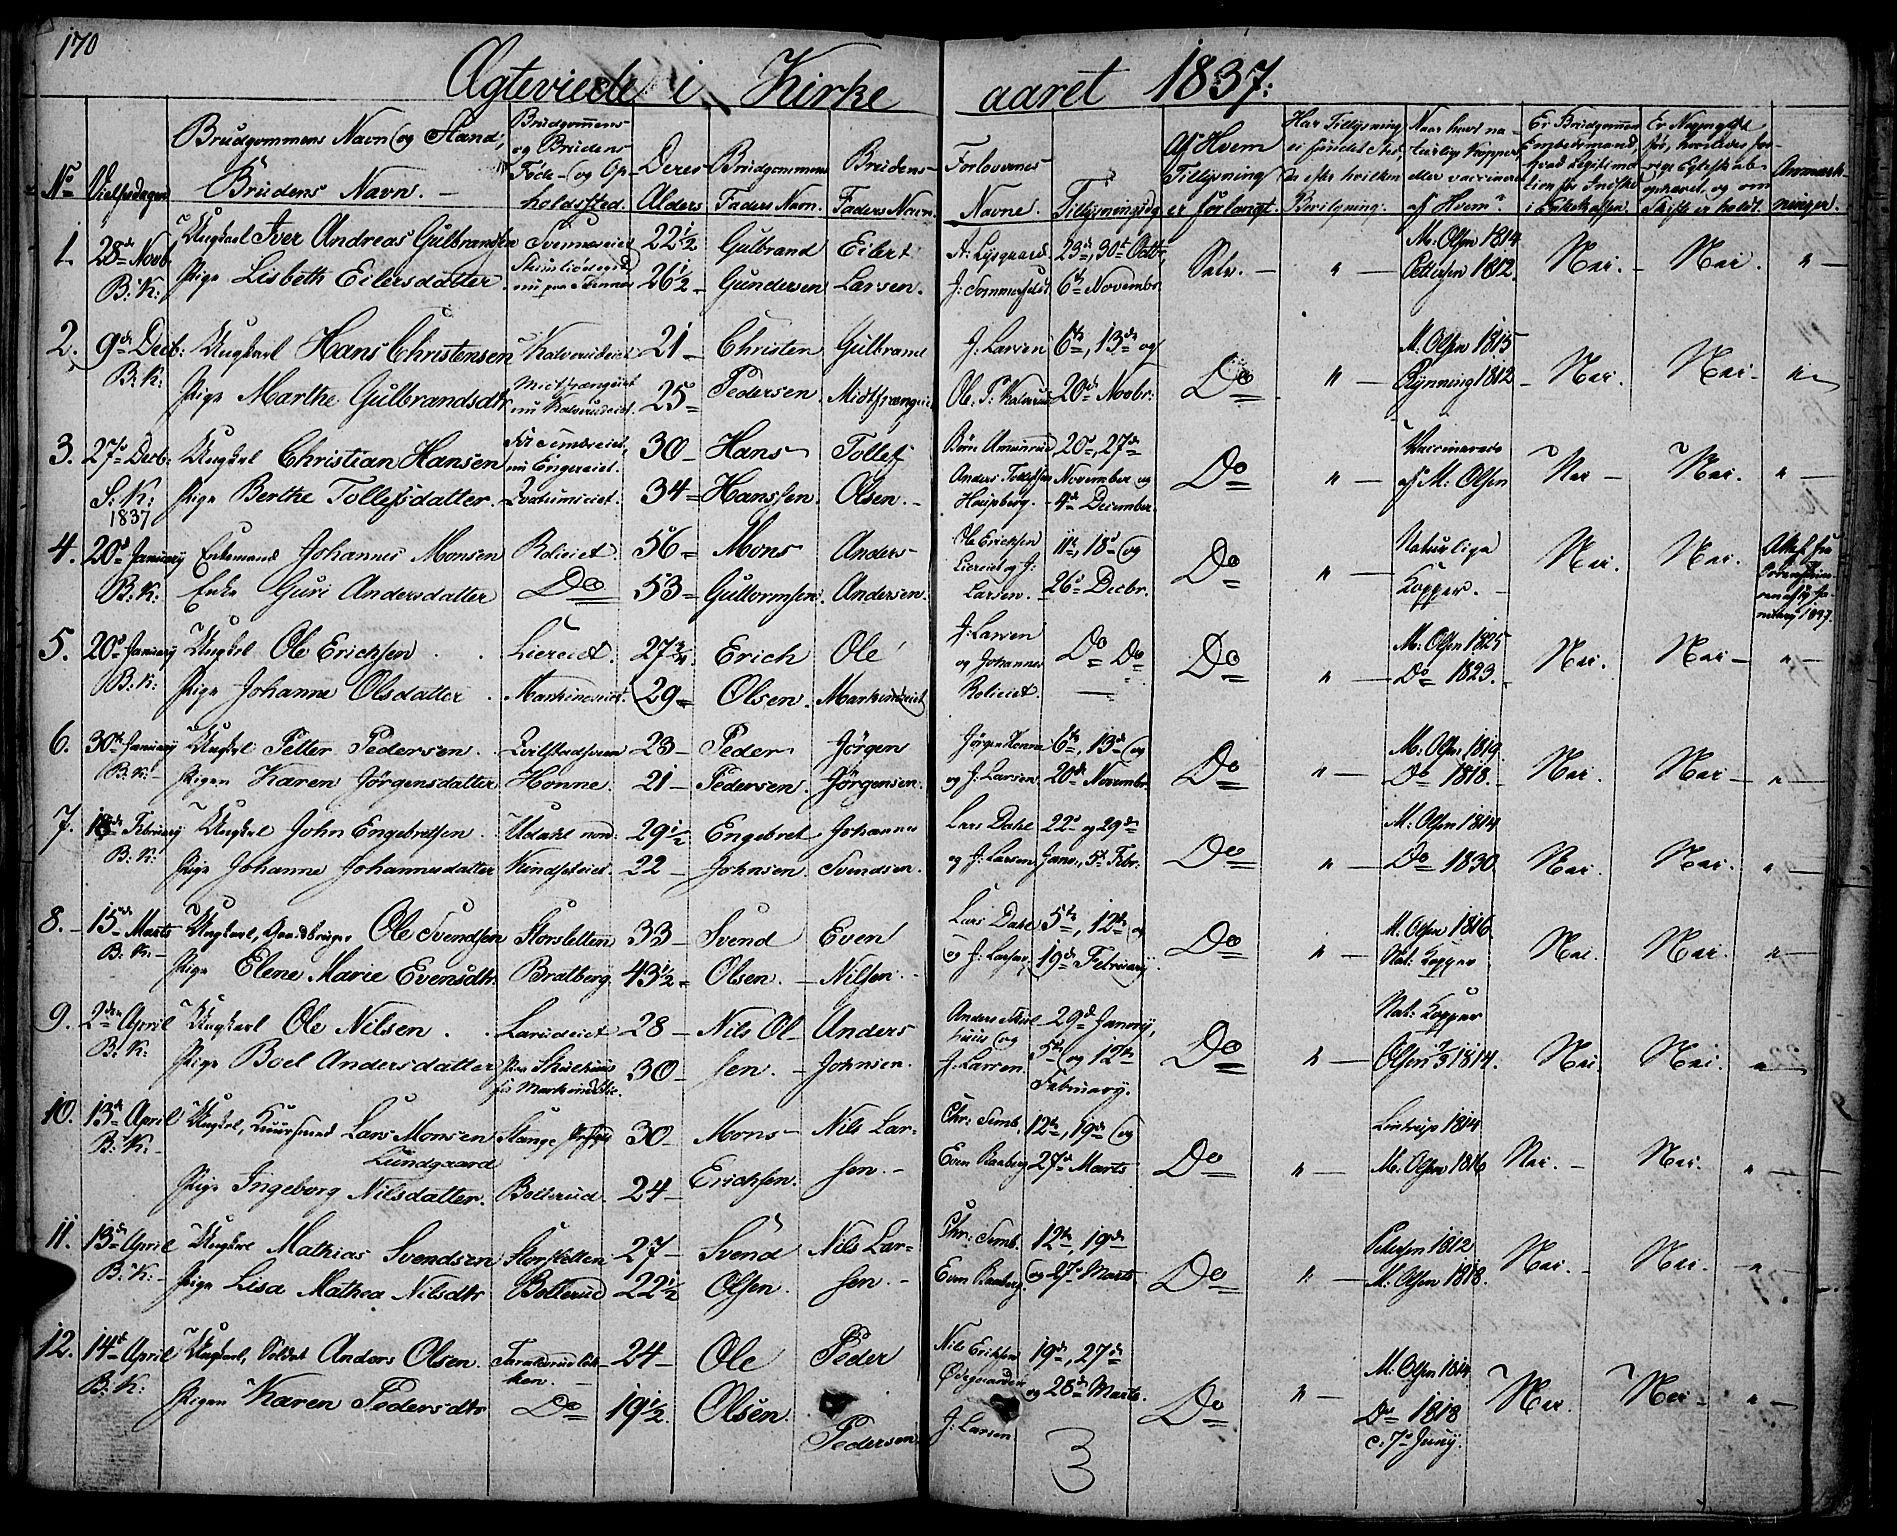 SAH, Biri prestekontor, Ministerialbok nr. 4, 1829-1842, s. 170